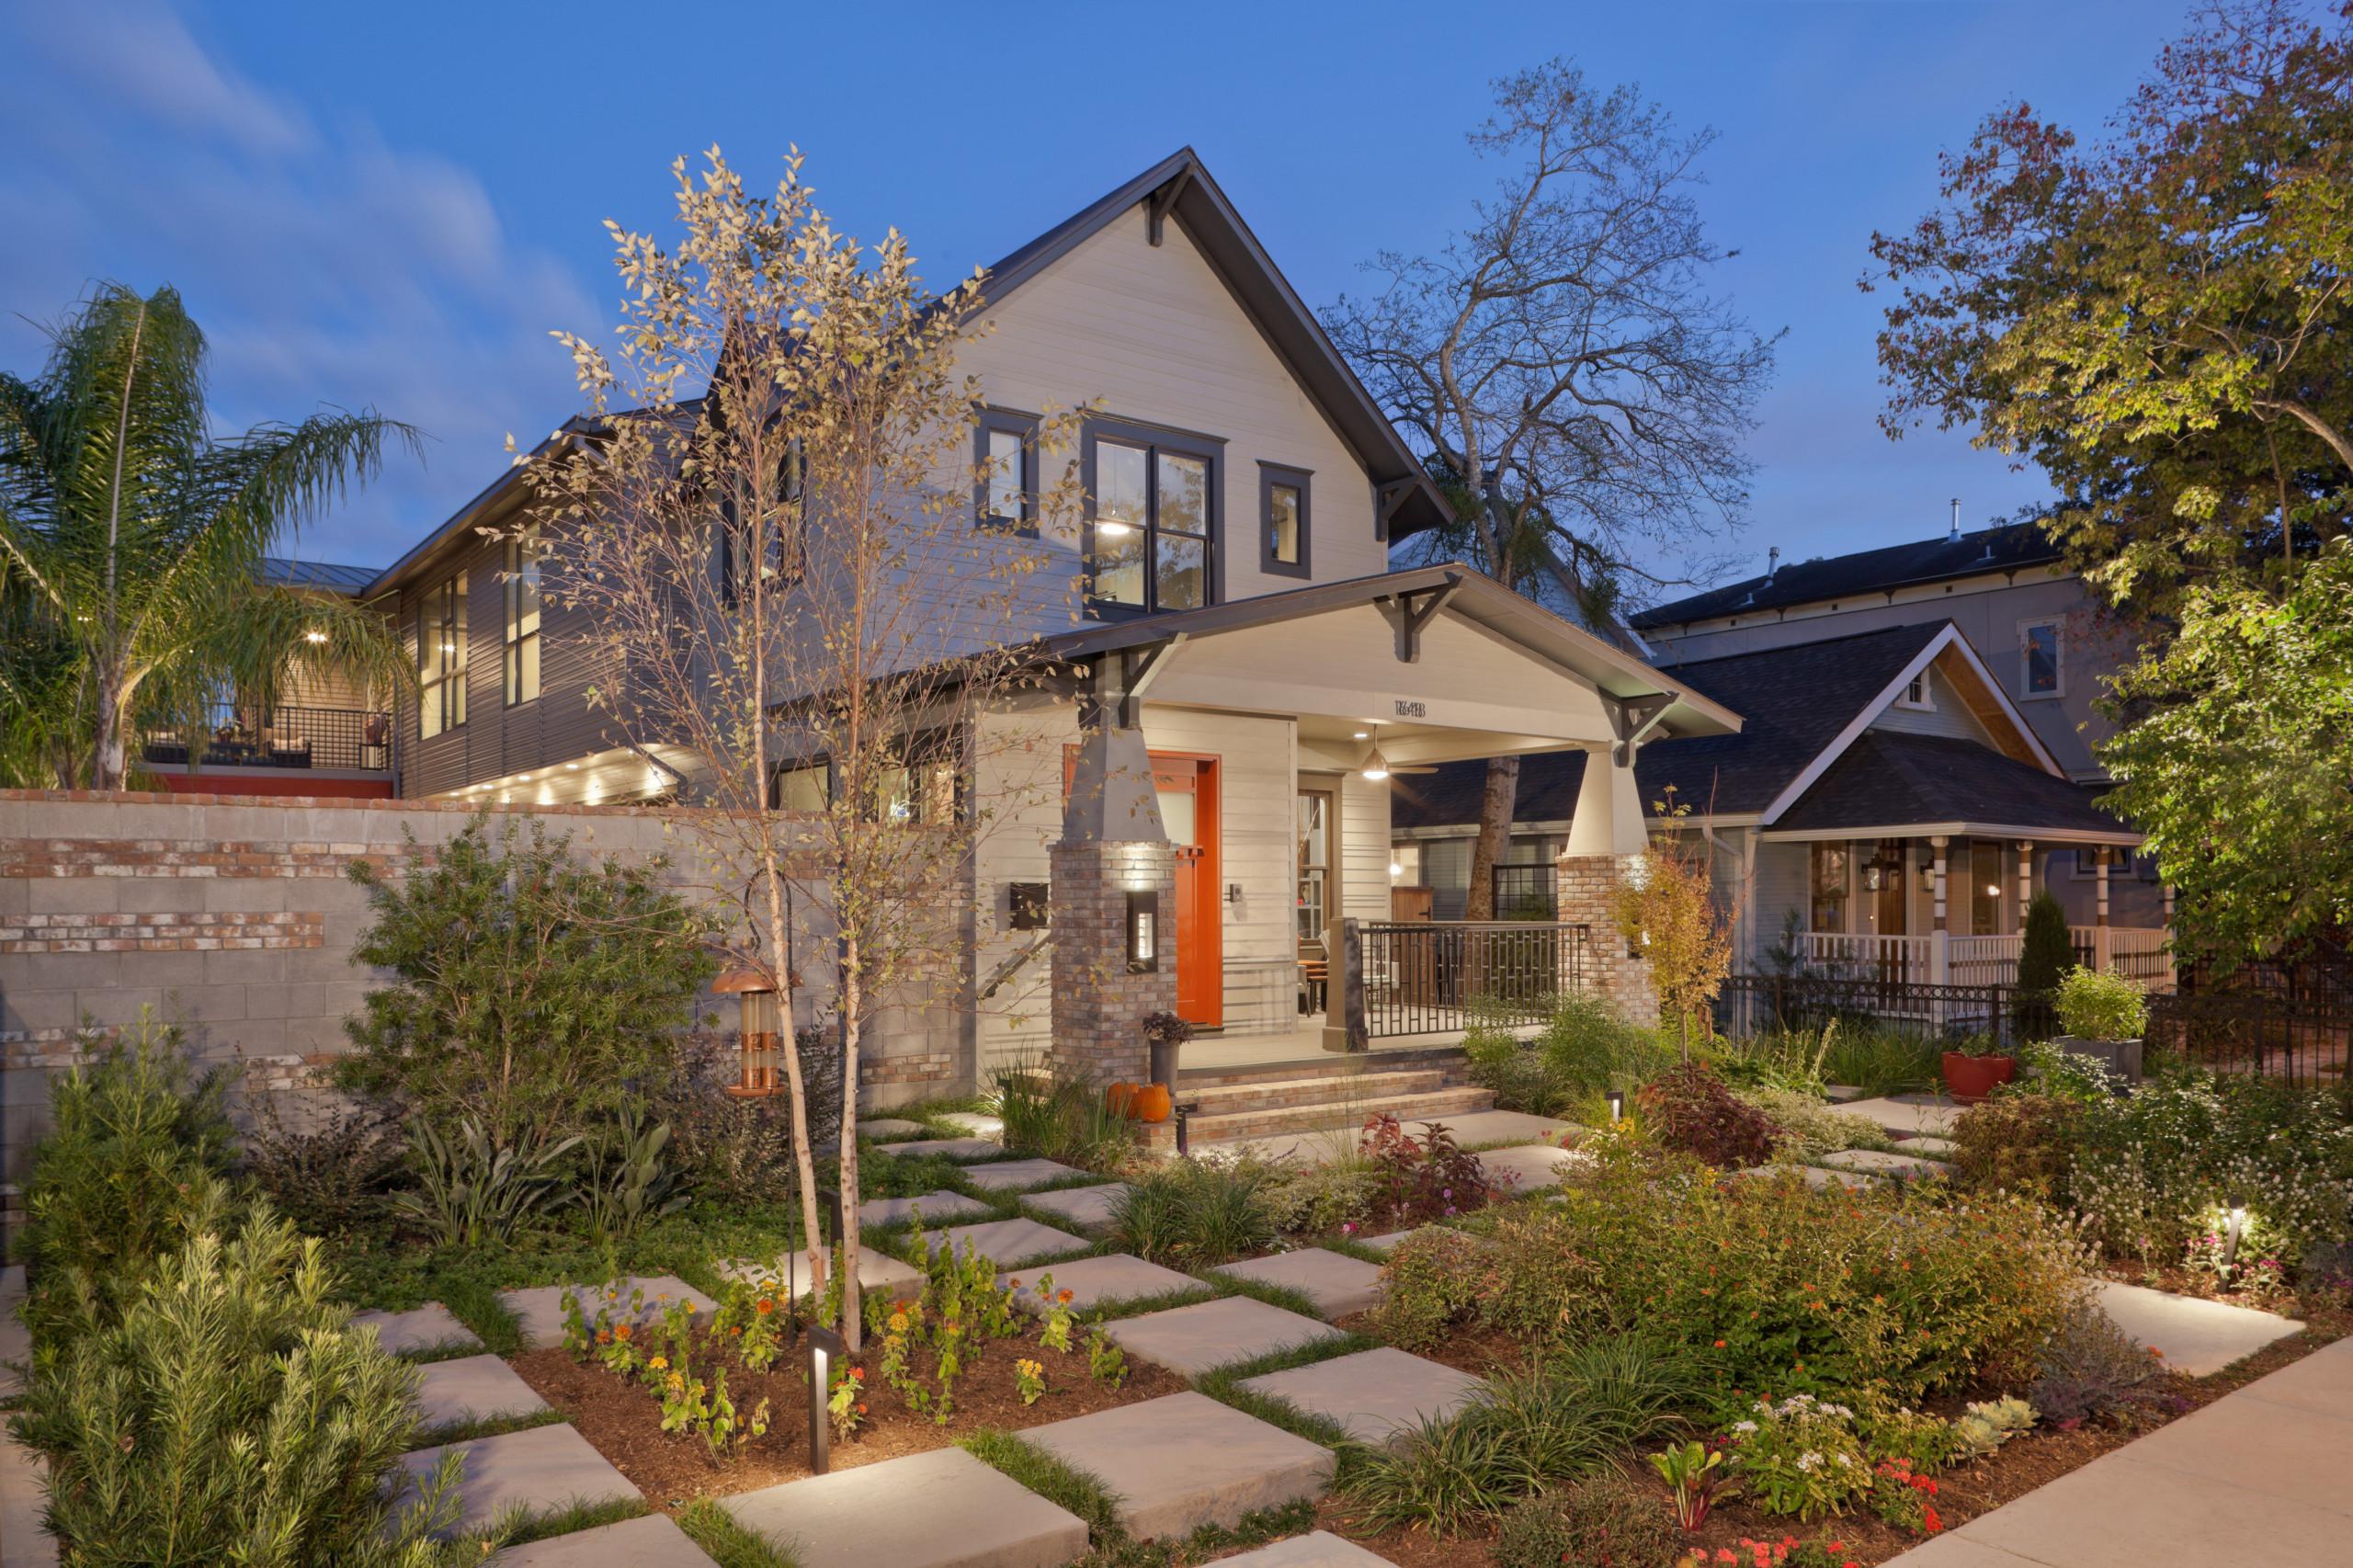 Greg Swedberg Architect